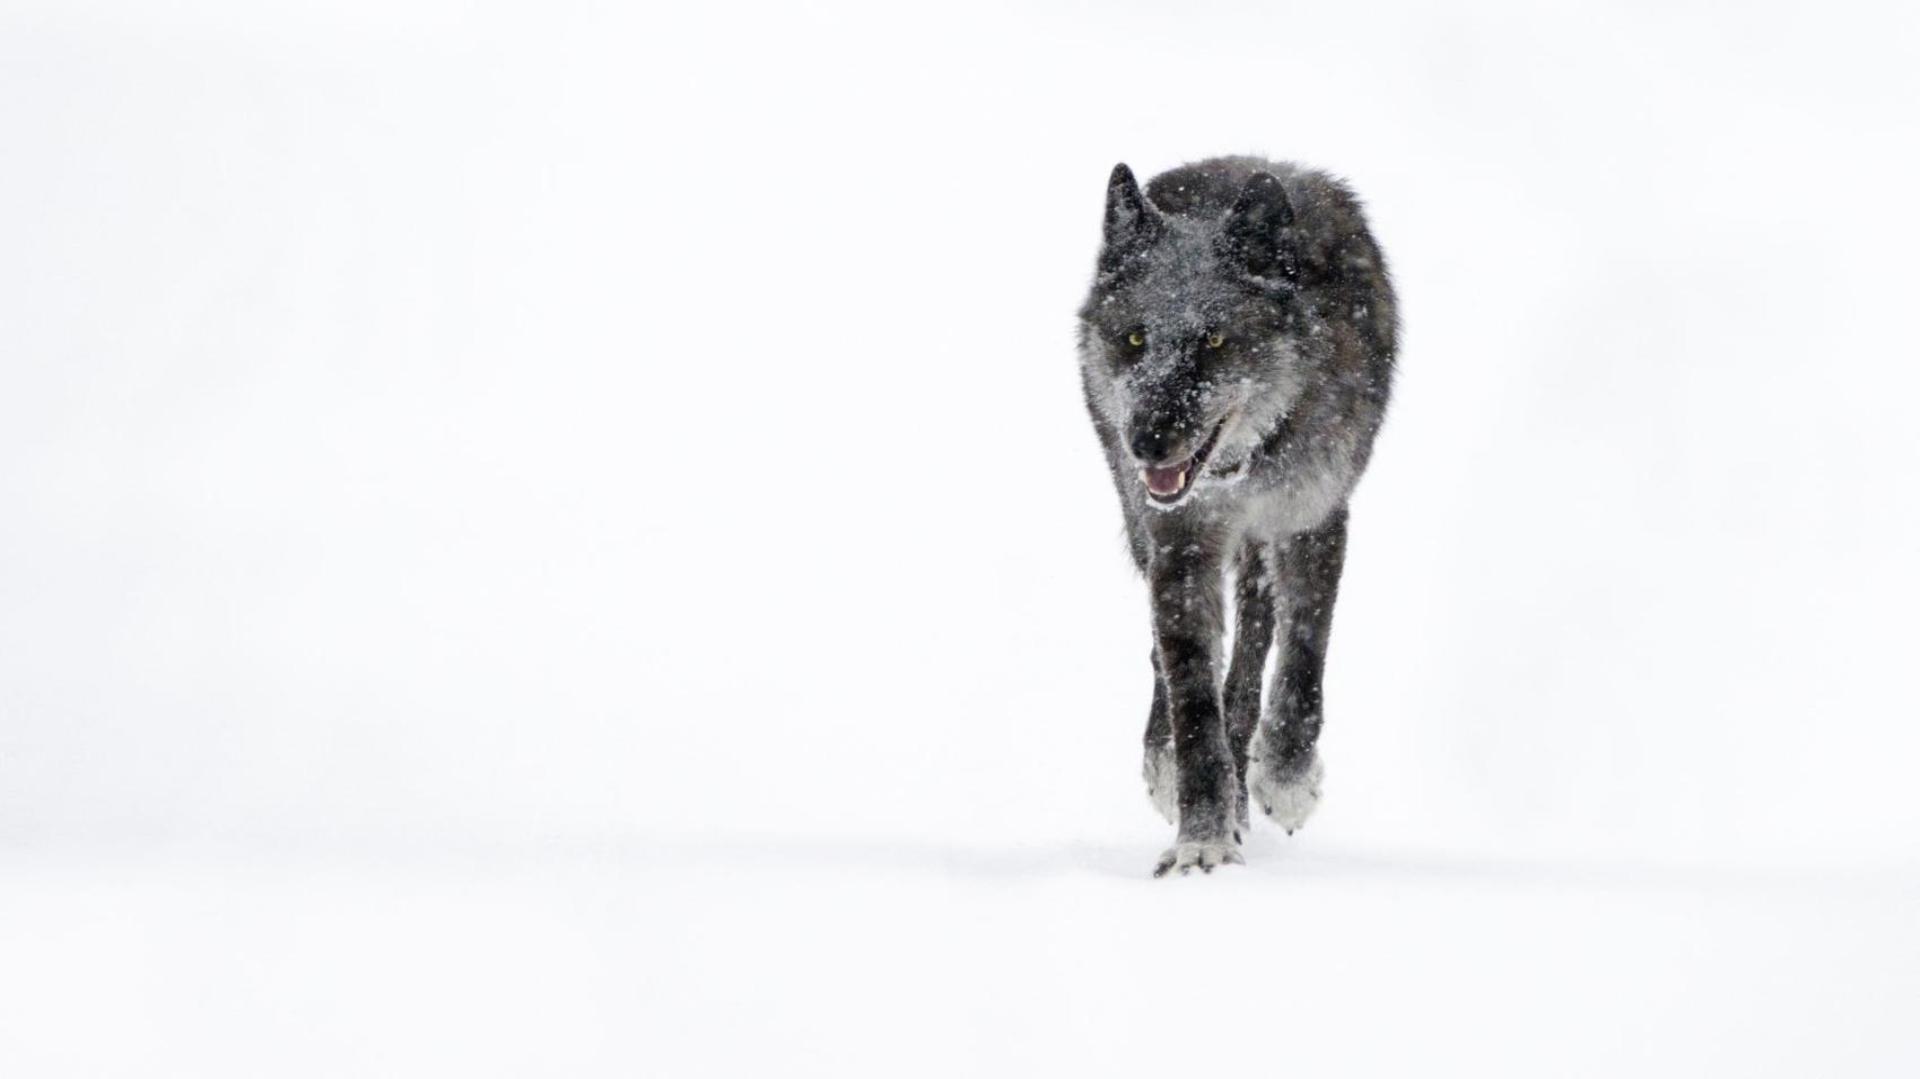 La loba que fue asesinada en Yellowstone (Foto: Facebook Jackson Hole News&Guide)